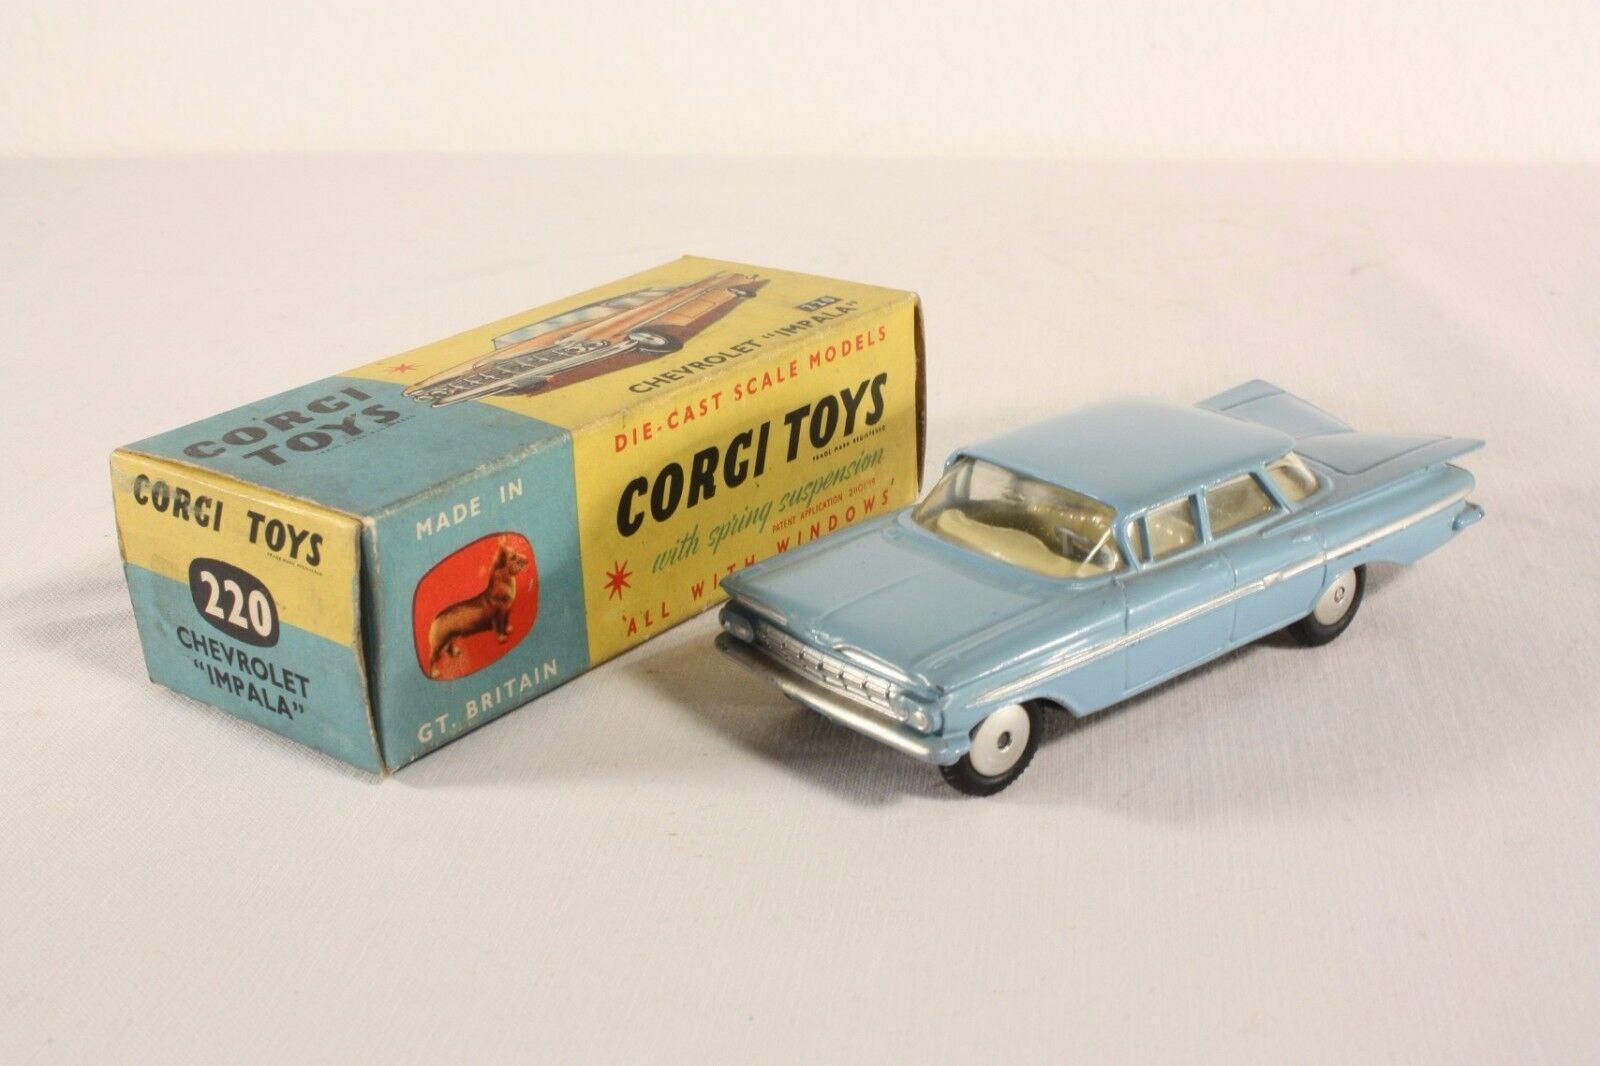 CORGI TOYS 220, Chevrolet Impala, Mint in Box #ab1715